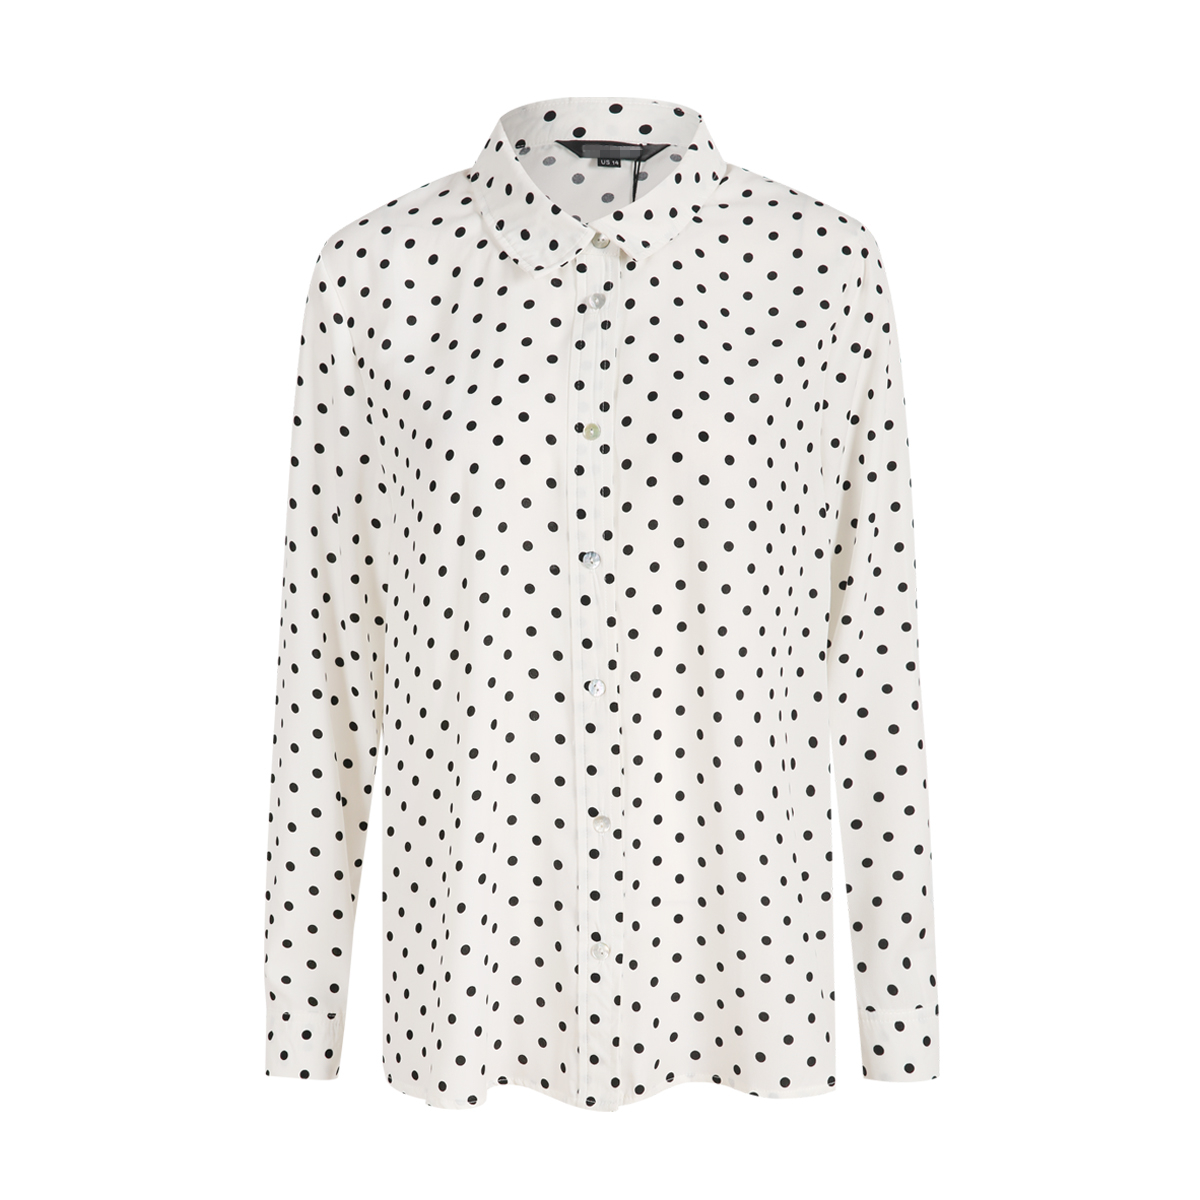 MCO New Basic Polka Dot Print Plus Size Women Blouse Casual Oversized Top Big Women Clothing Simple Spot Loose Shirt 5xl 6xl 7xl